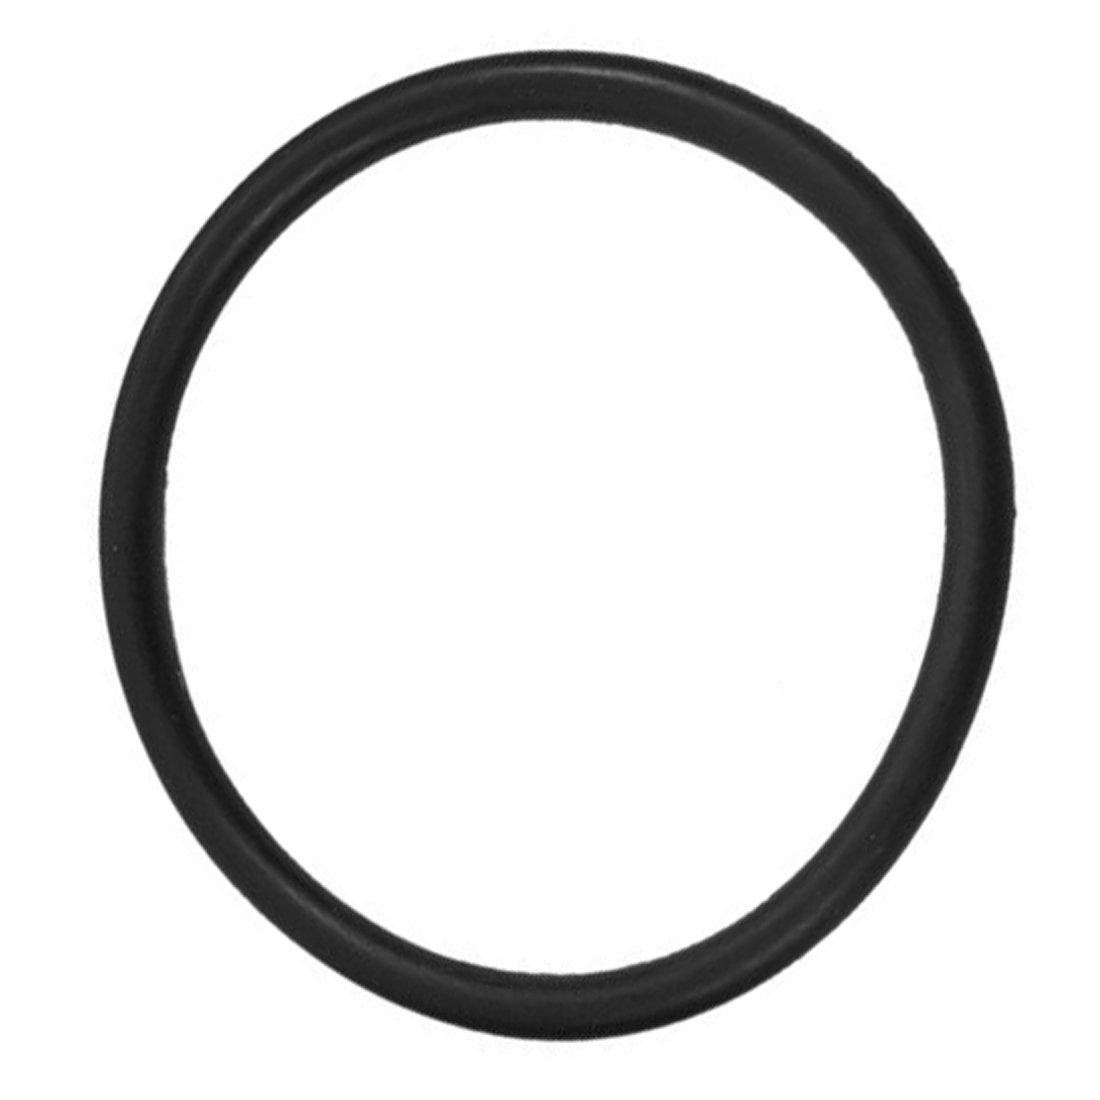 SNOWINSPRING 5 Stueck 35mm x 5mm Gummi O Ring oel Dichtung Dichtschiebe schwarz